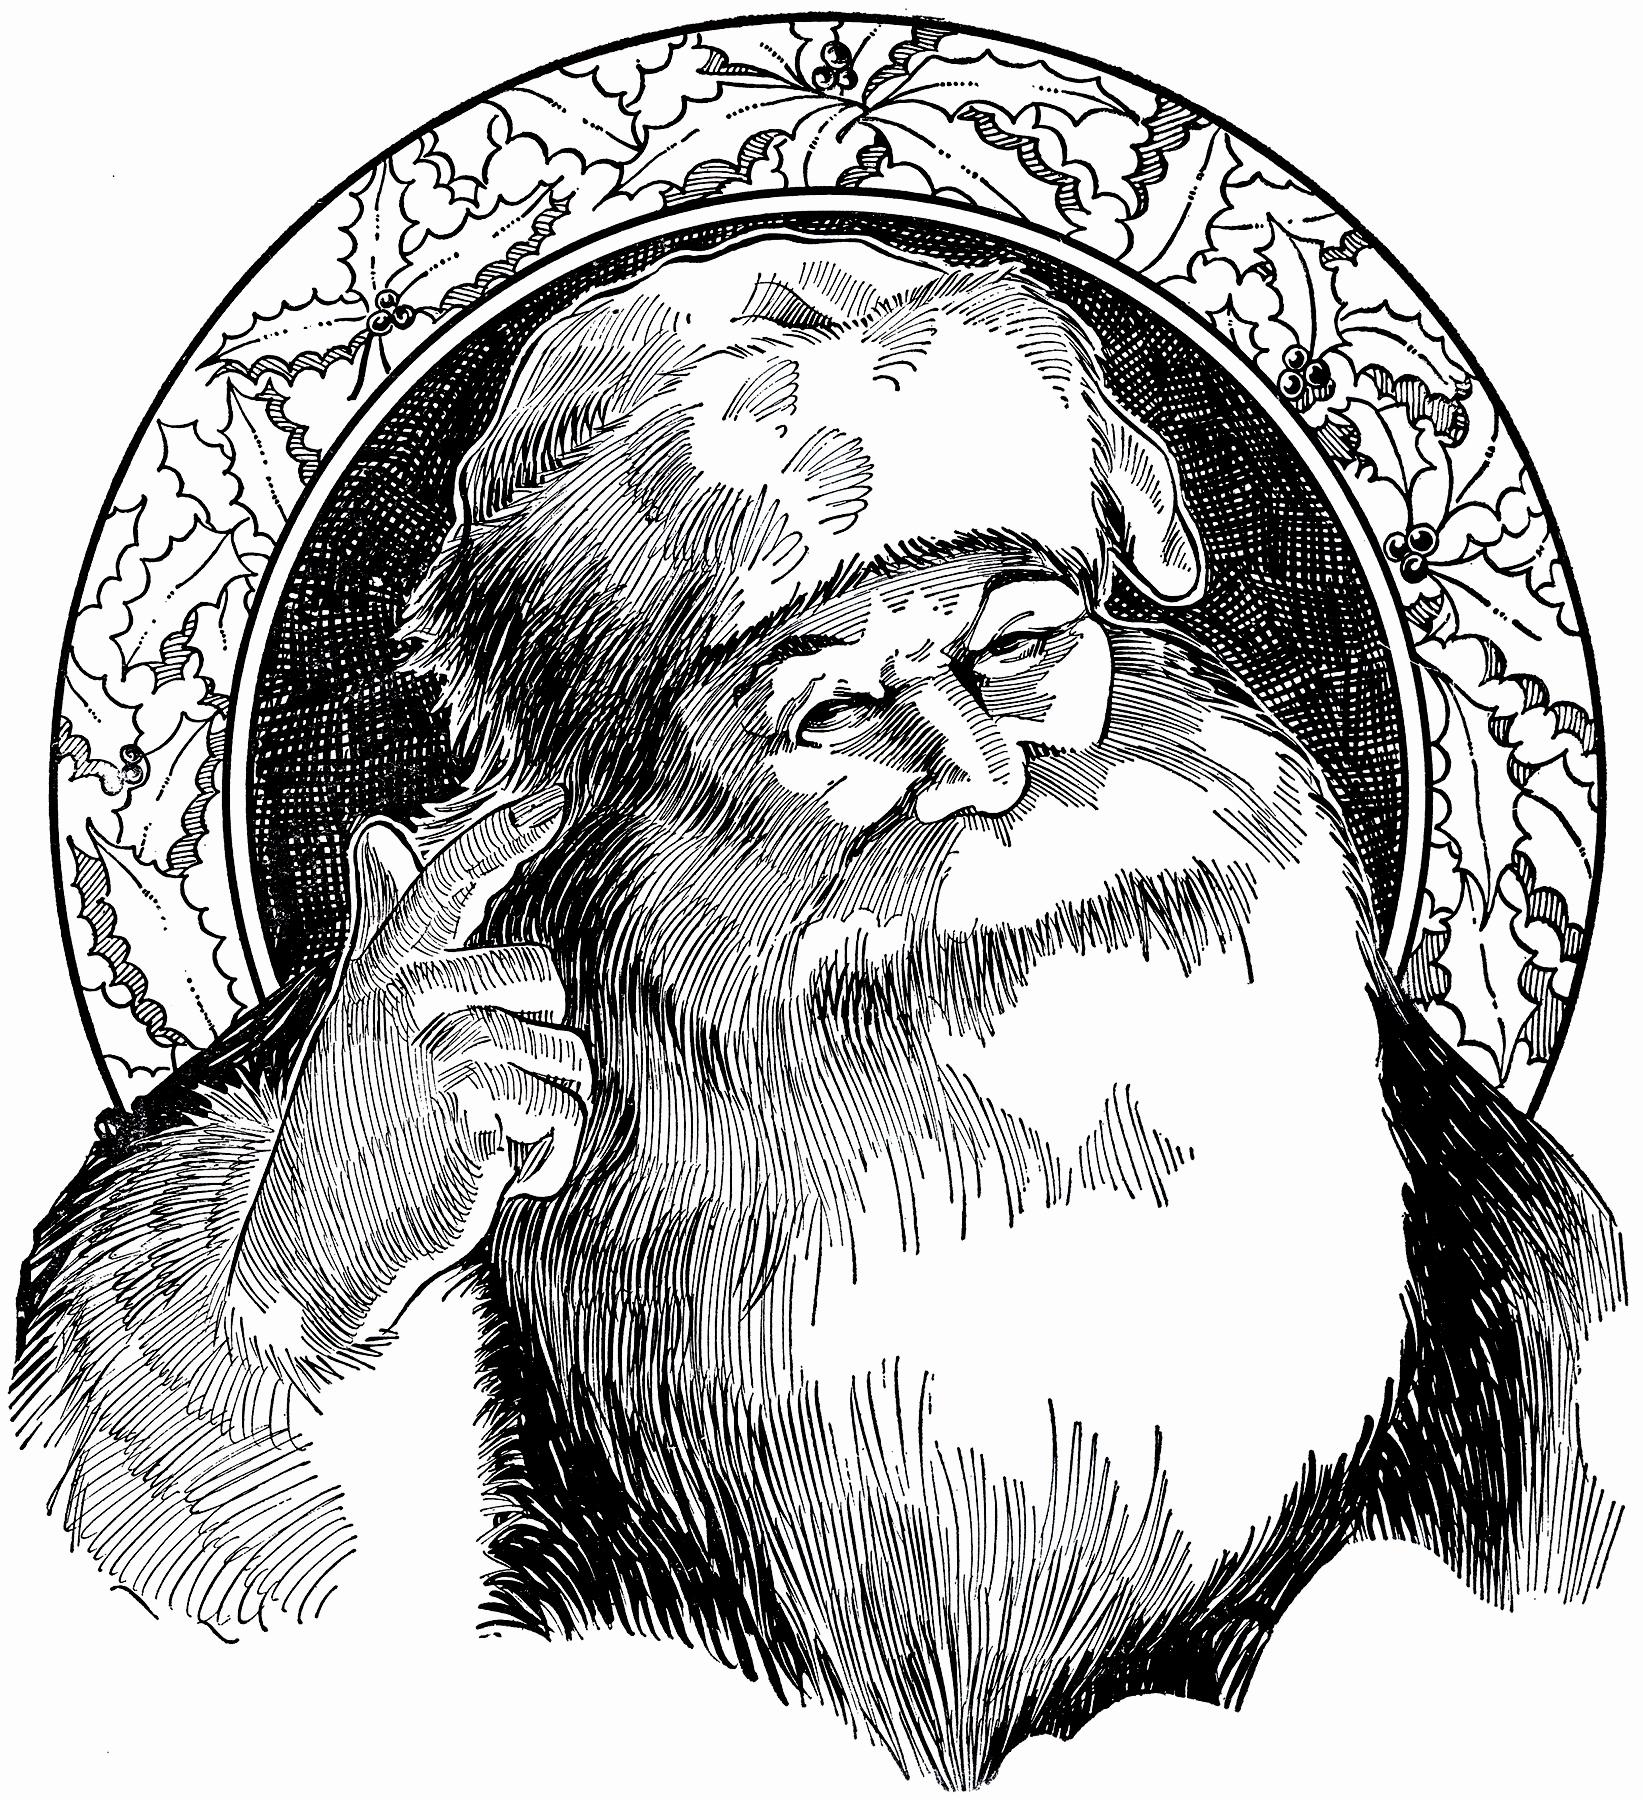 Black and White Illustration Awesome 6 Santa Illustrations Black and White the Graphics Fairy